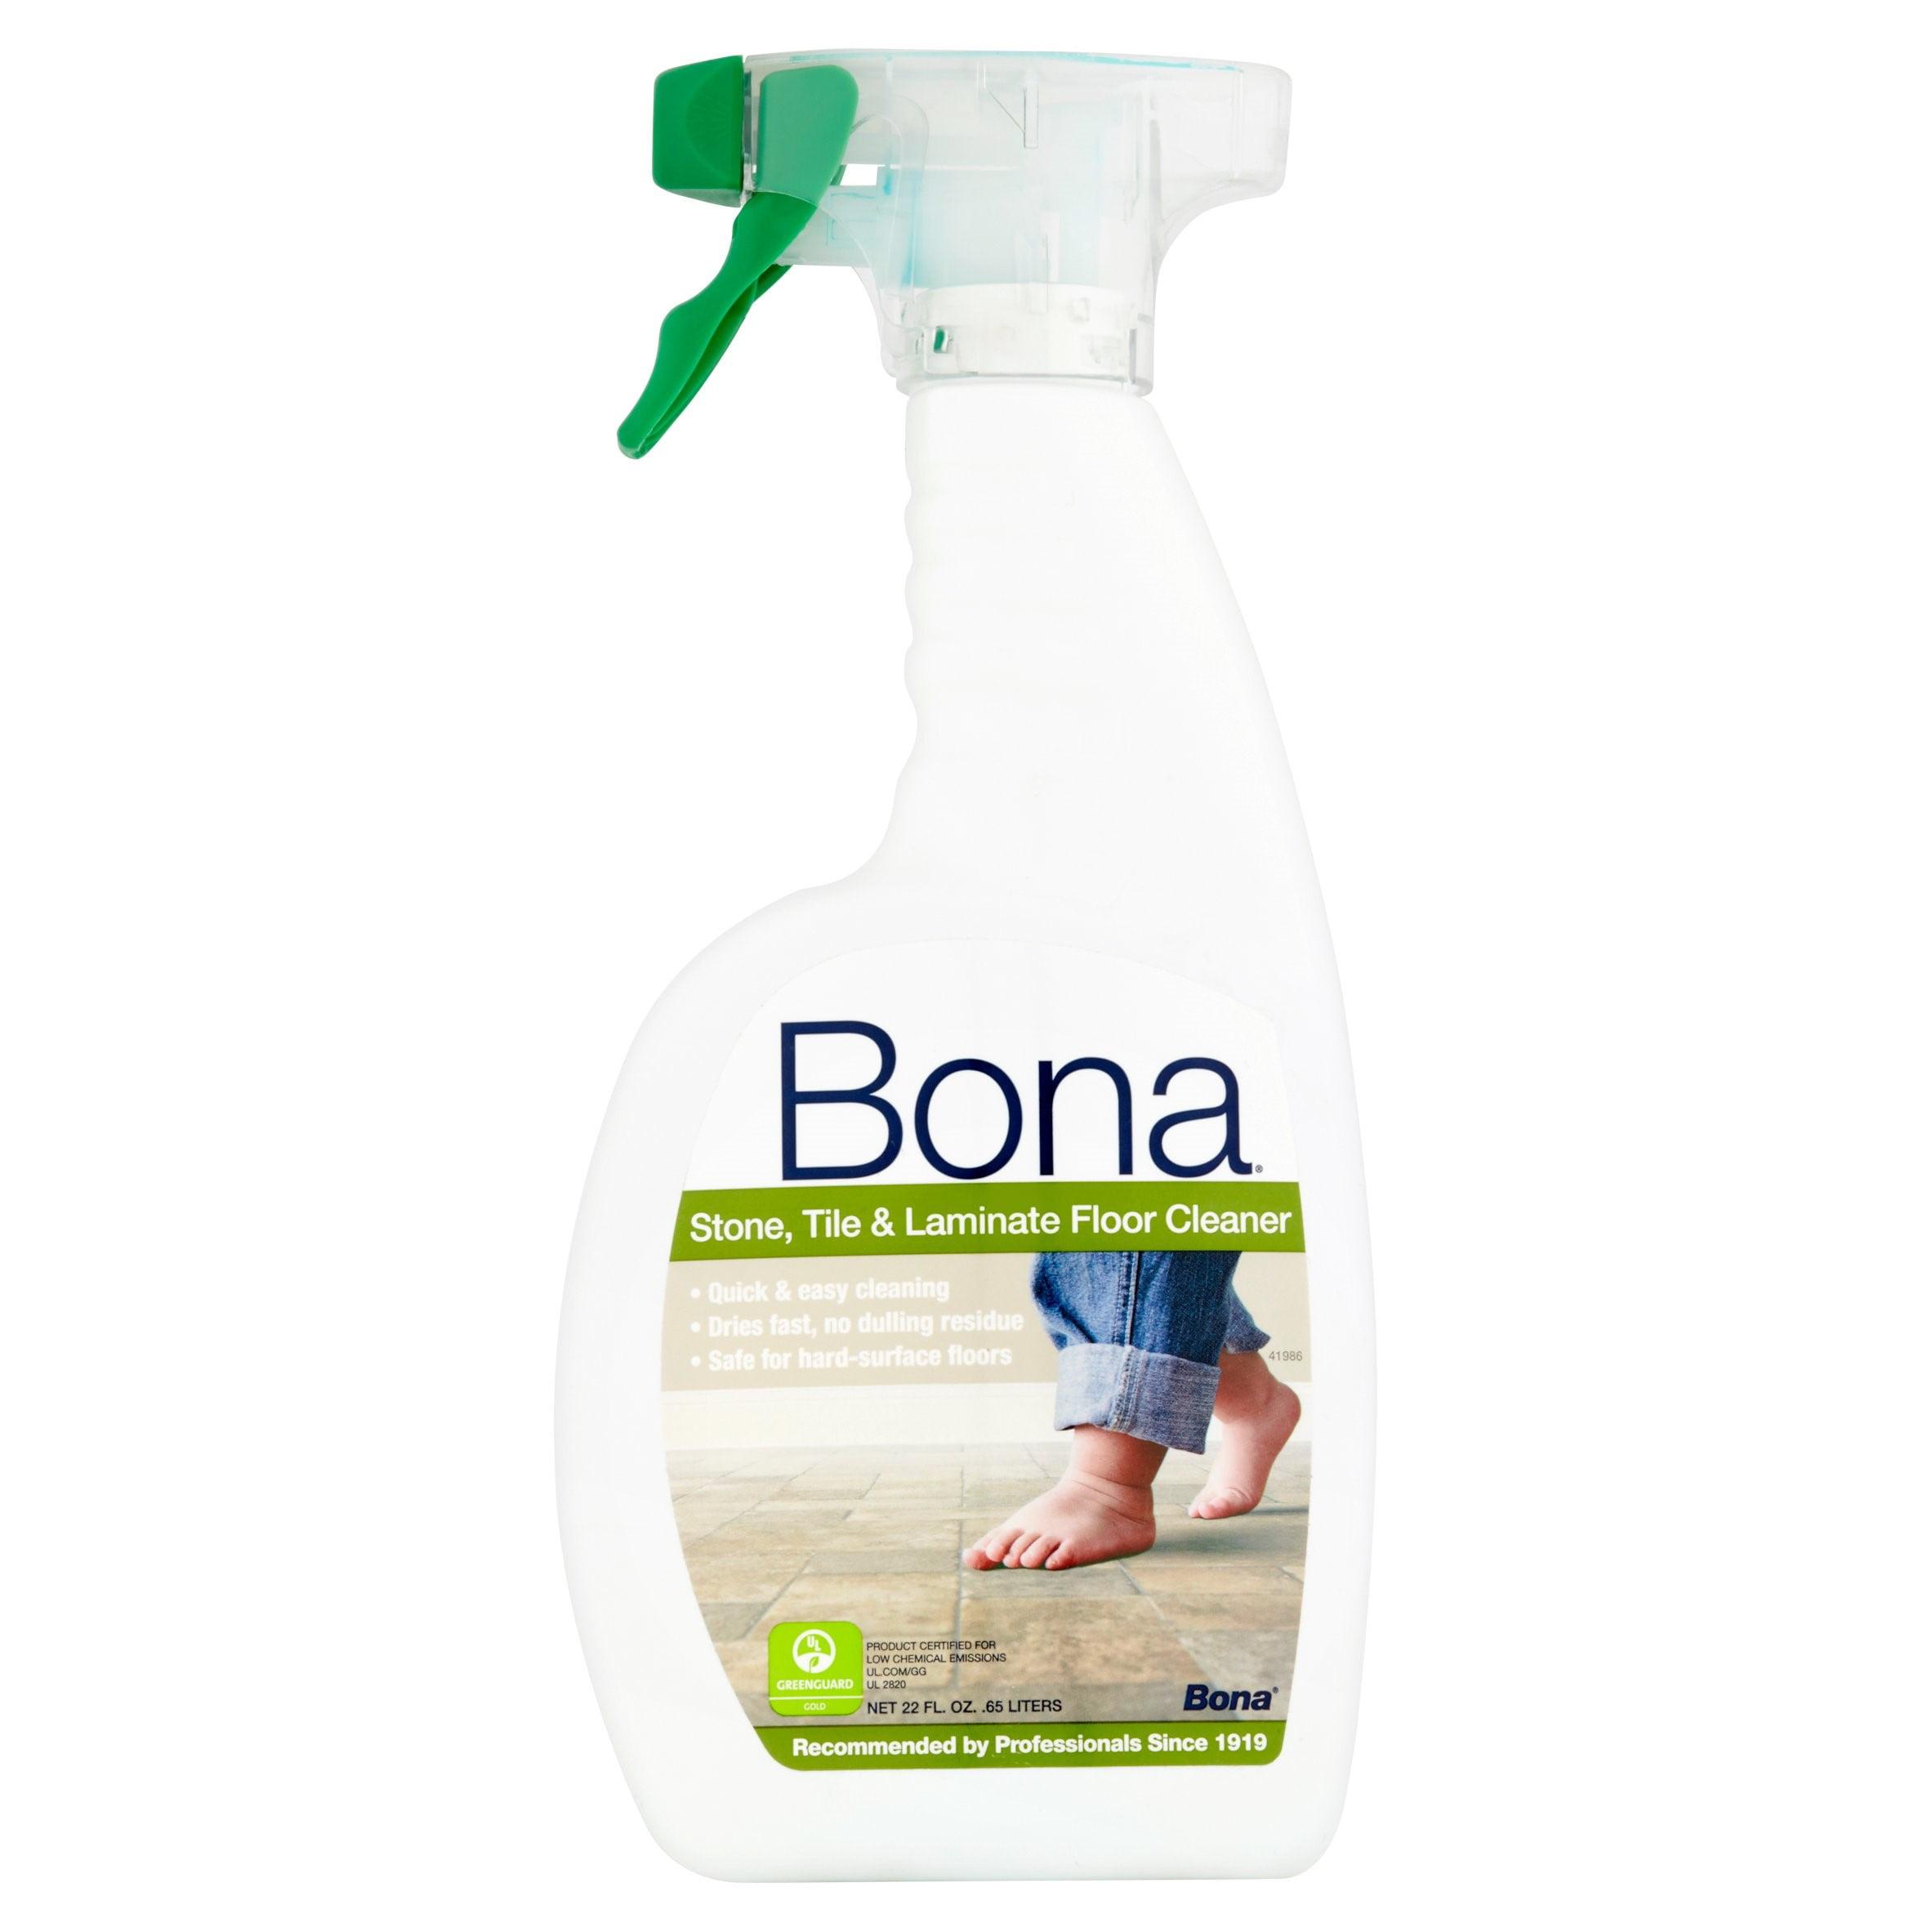 Bona Stone Tile Laminate Floor Cleaner 22 Oz Walmart